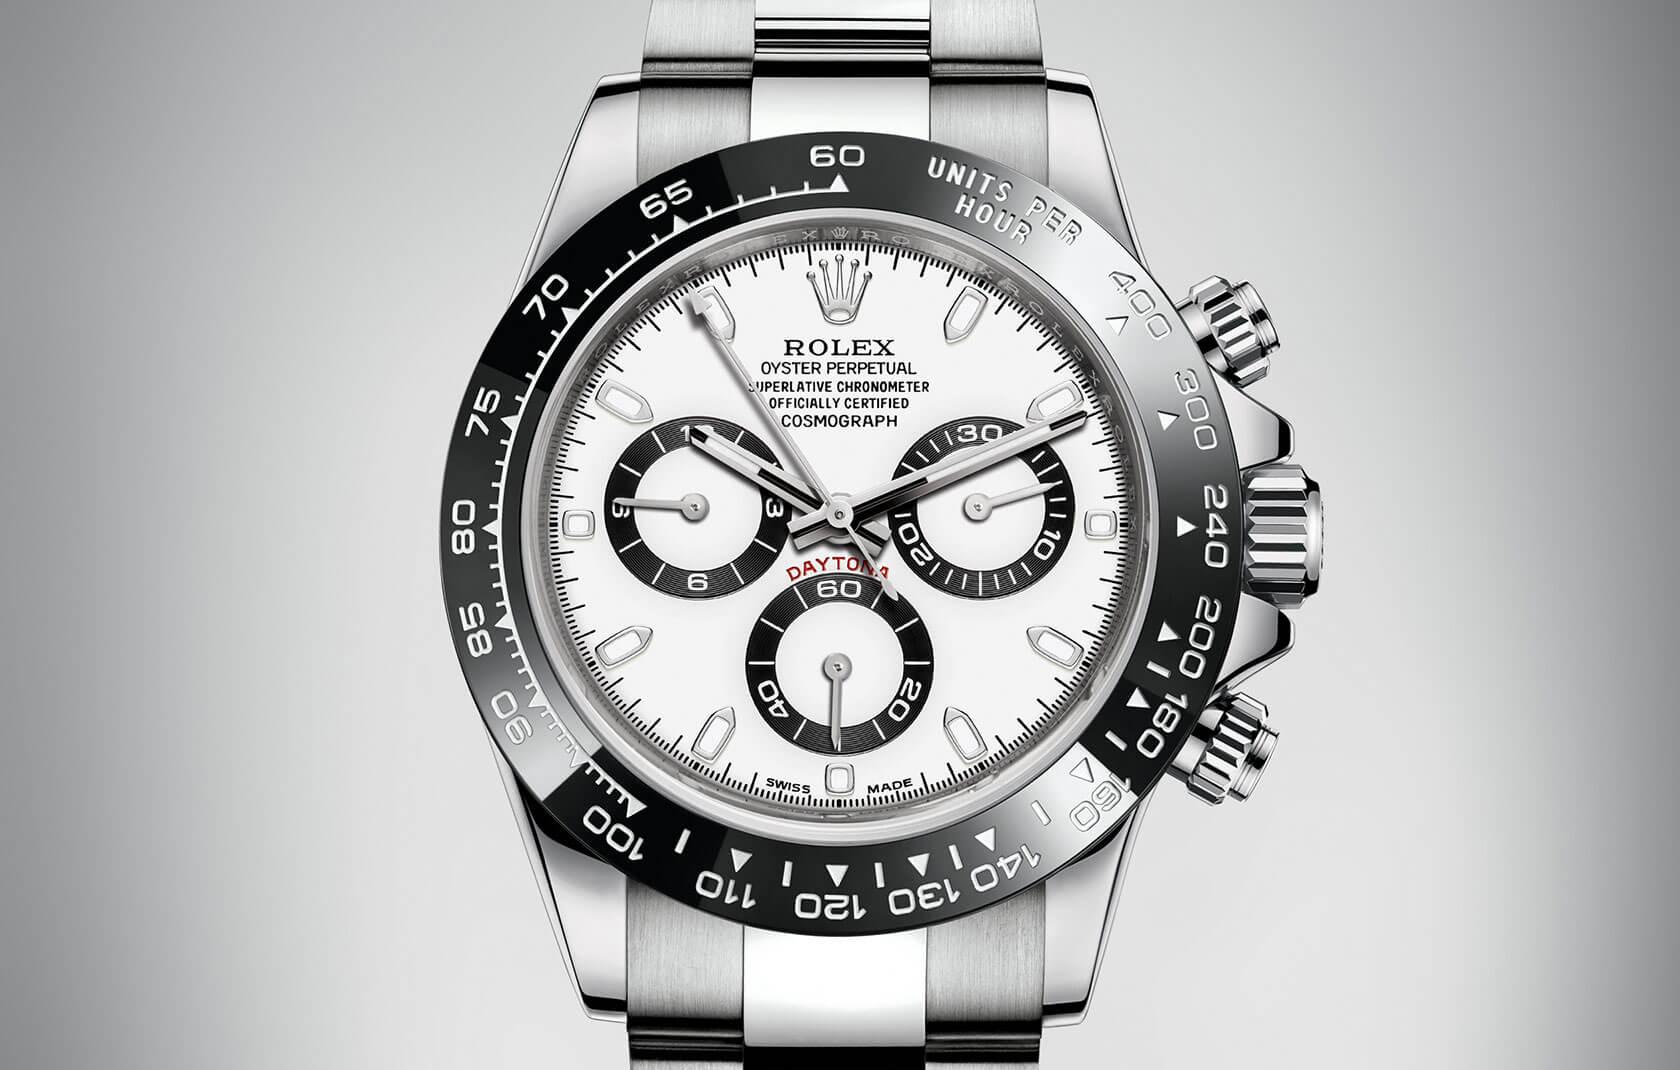 Rolex Cosmograph Daytona 2016